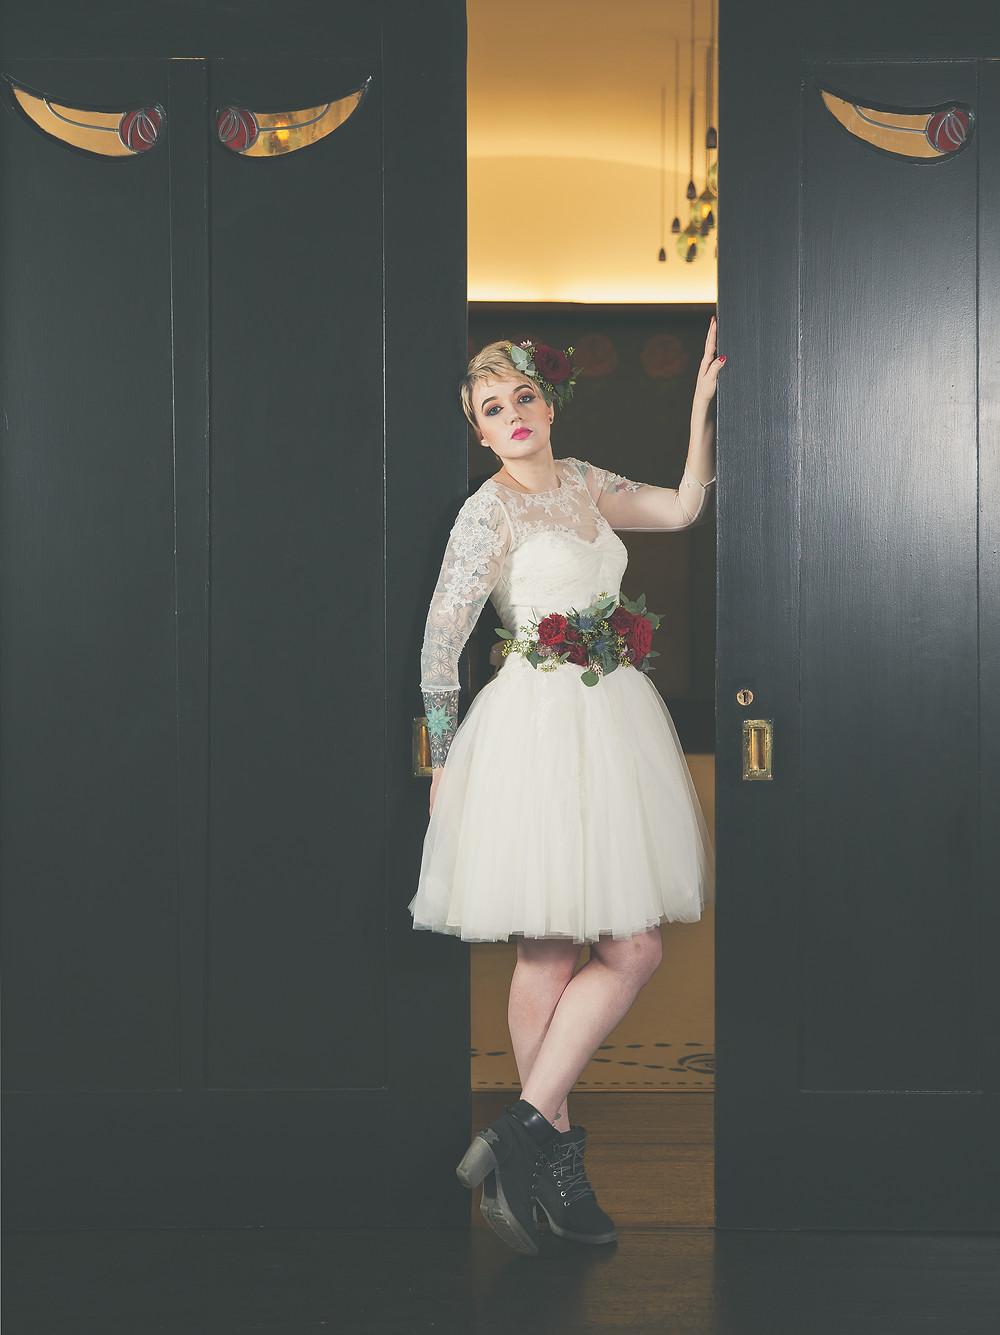 Rock & Roll Bride, alternative Bride, alternative bridal flowers